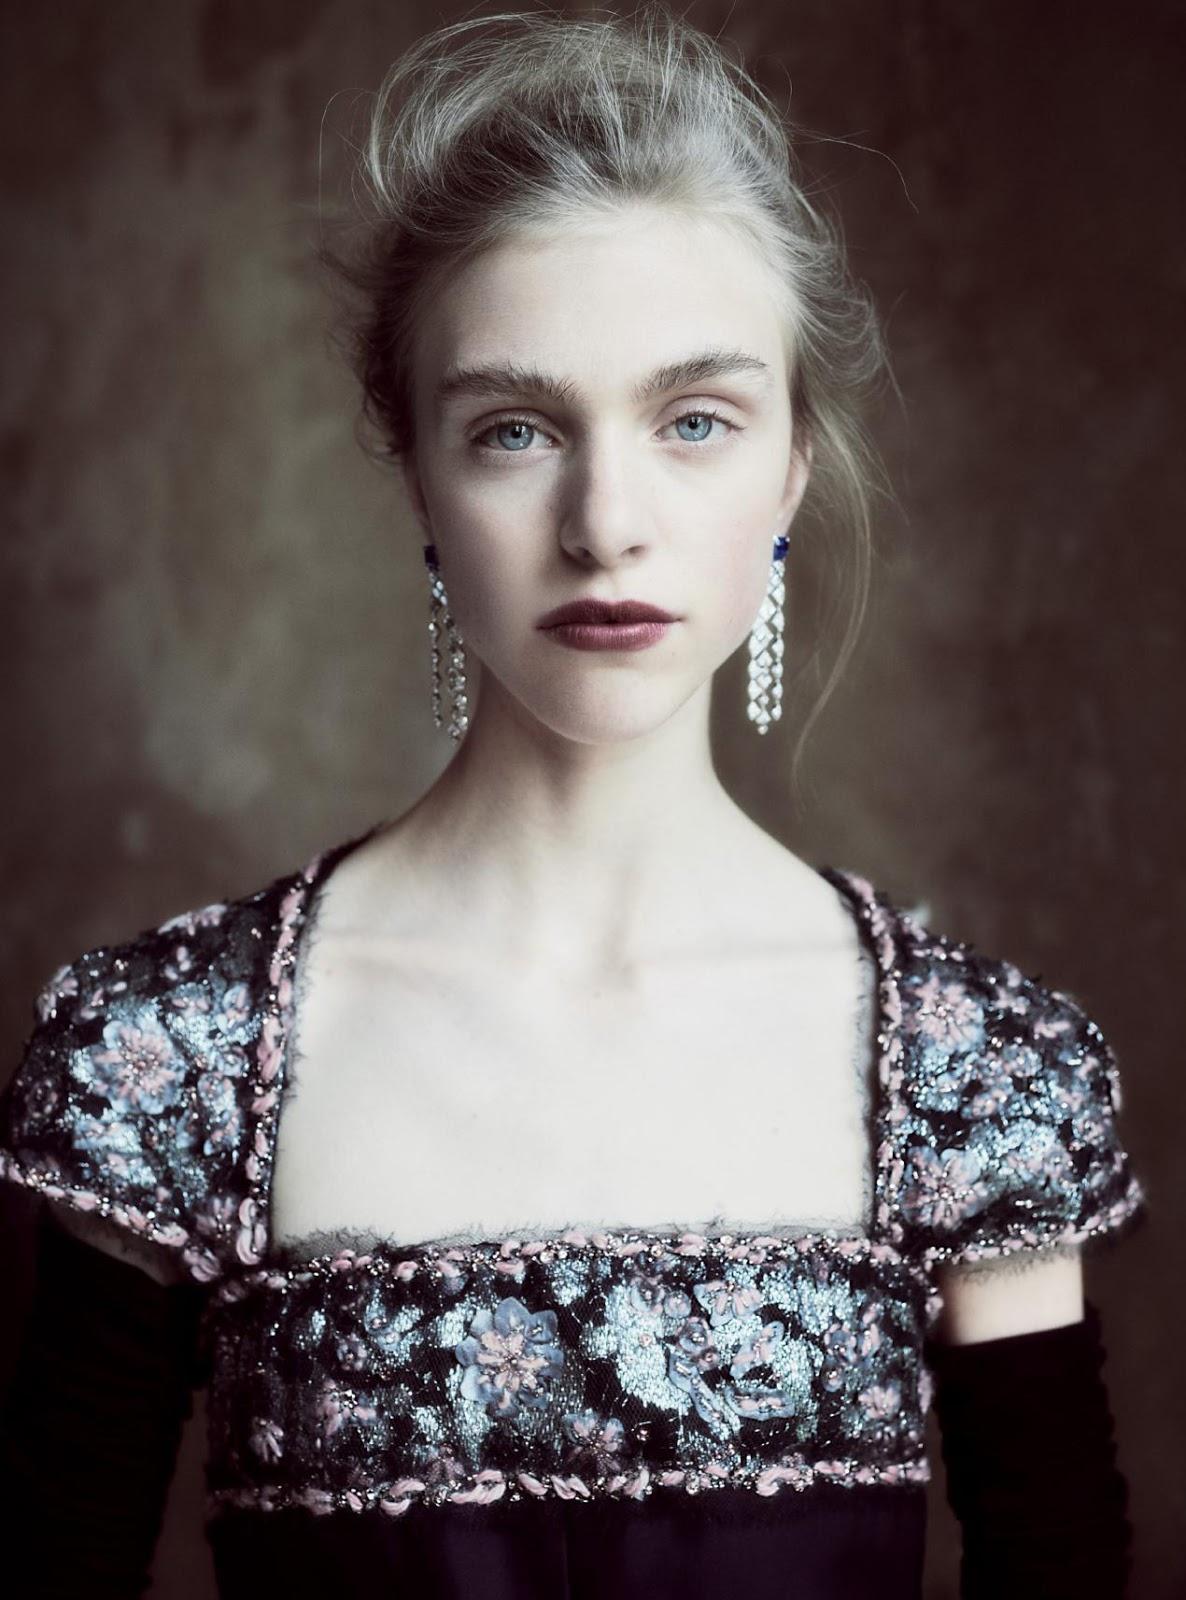 платье из шелка, Chanel Haute Couture; серьги из белого золота с бриллиантами и сапфирами, Chanel Fine Jewellery